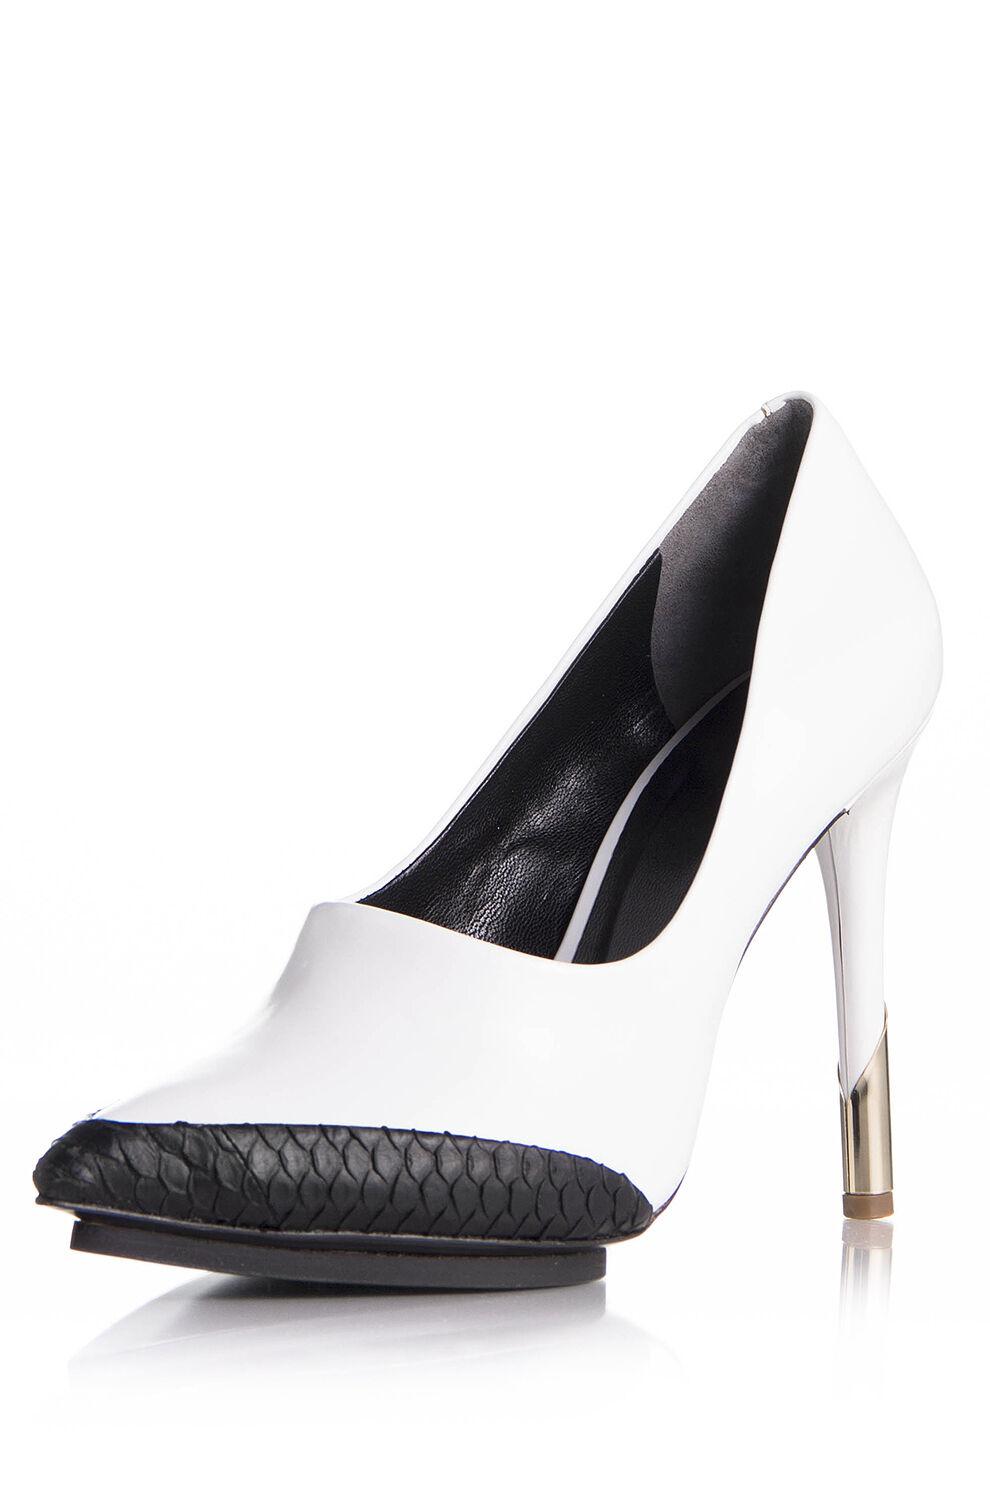 rivenditore di fitness Rachel Roy Roy Roy Beeana bianca nero Platform Heels Leather SEXY NIB oro scarpe NEW  buon prezzo